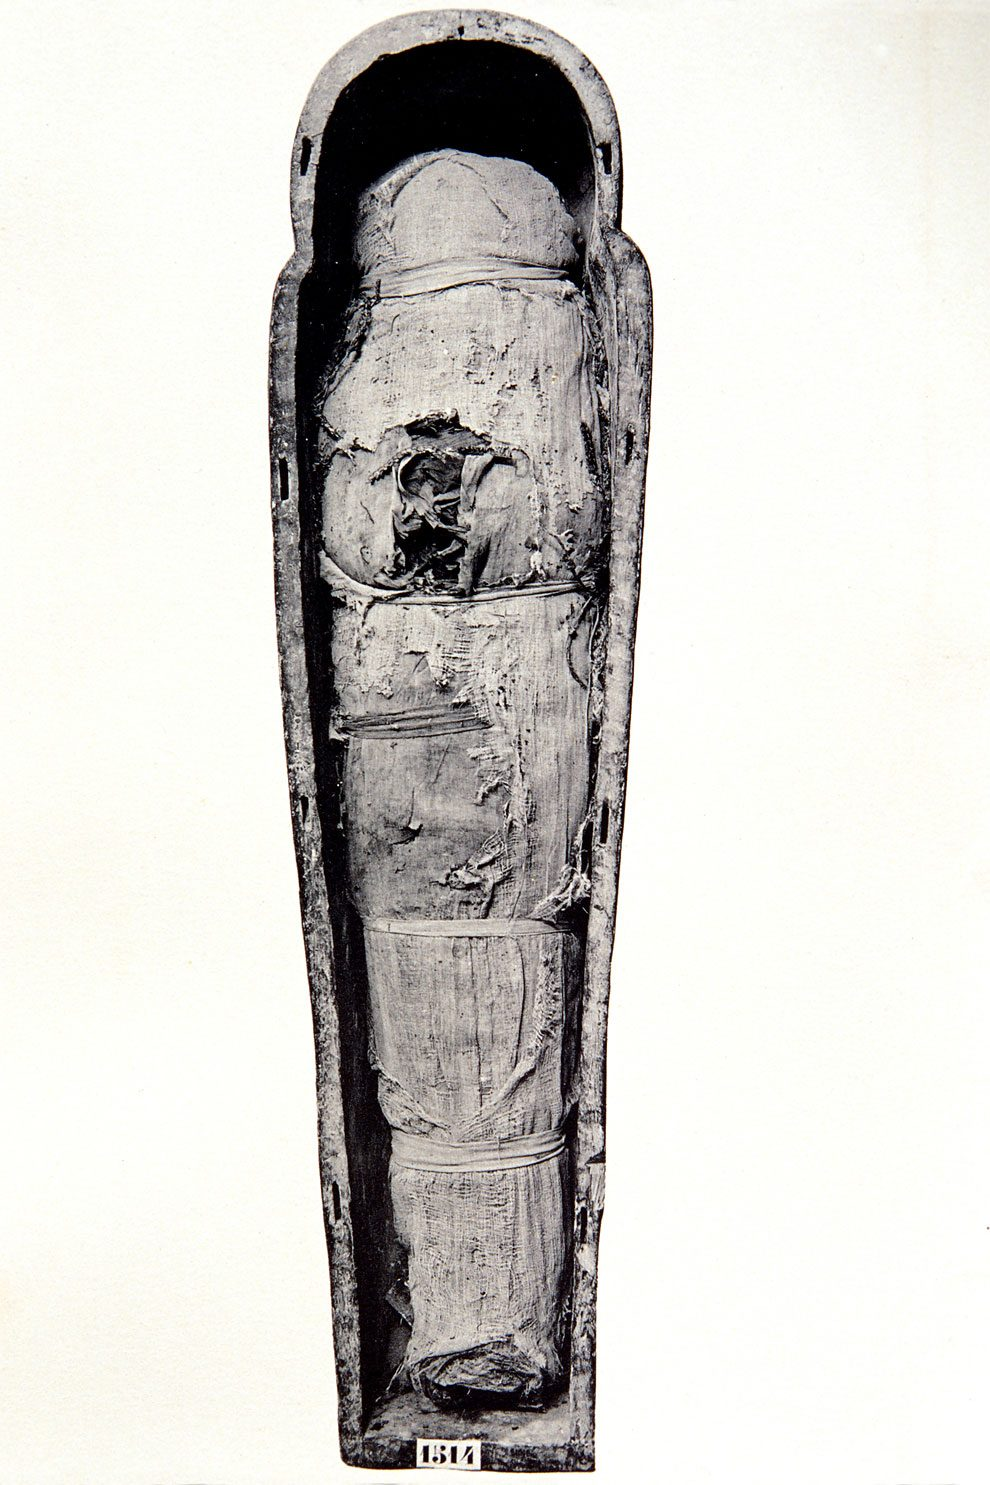 mummie-egiziane-foto-museo-cairo-04